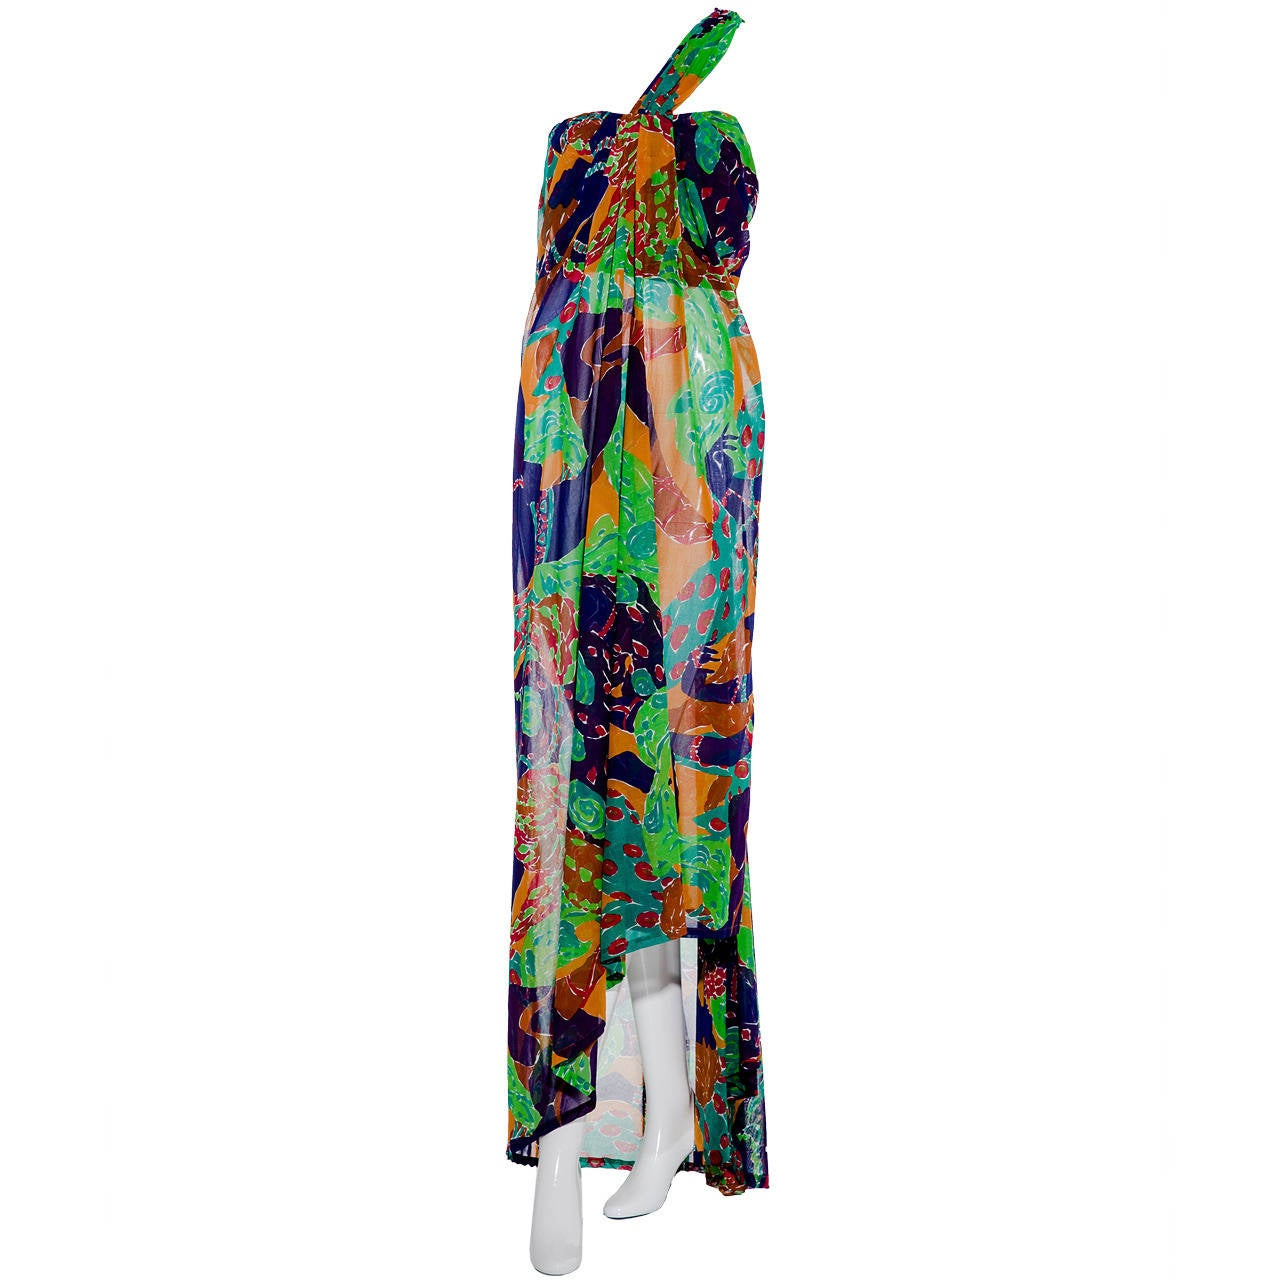 RARE 1990s Yves Saint Laurent Green Cotton One Shoulder Dress